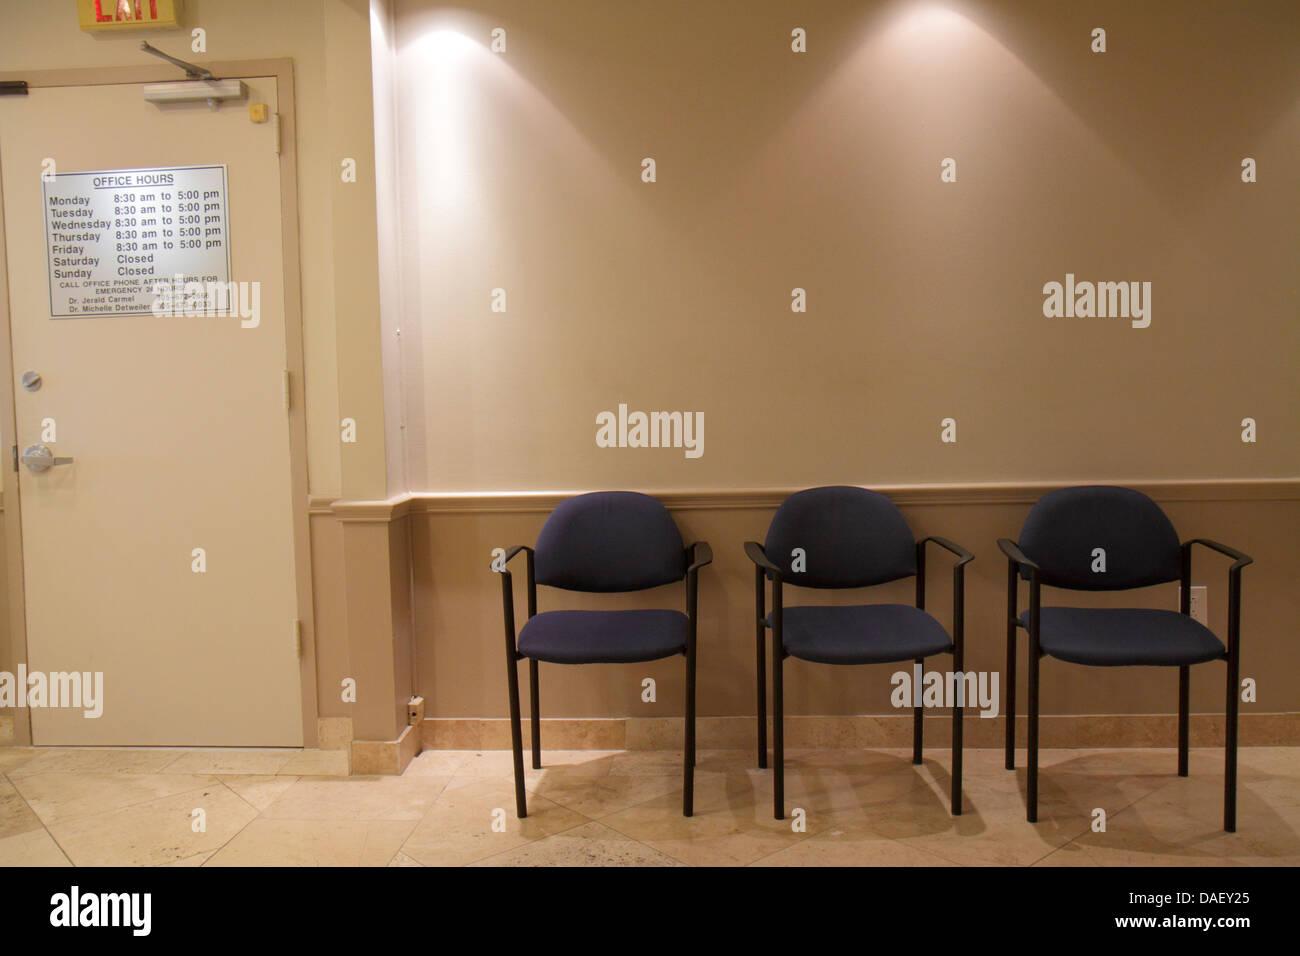 Chaises Salle D Attente Cabinet Medical miami beach florida centre médical mount sinai hospital